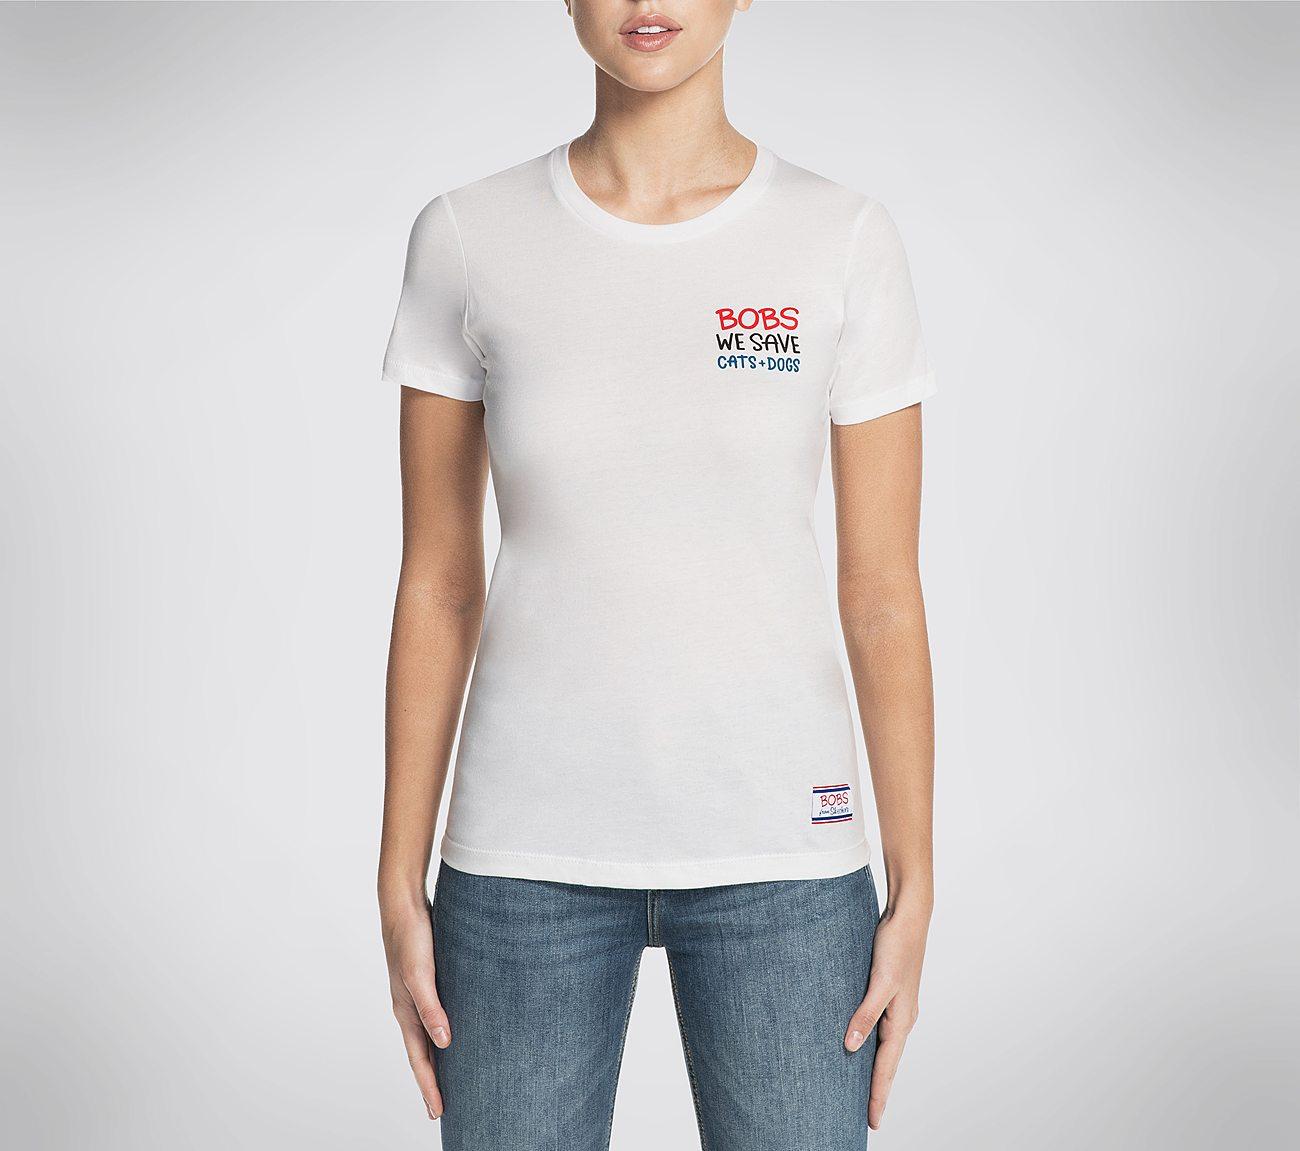 BOBS We Save Tee Shirt